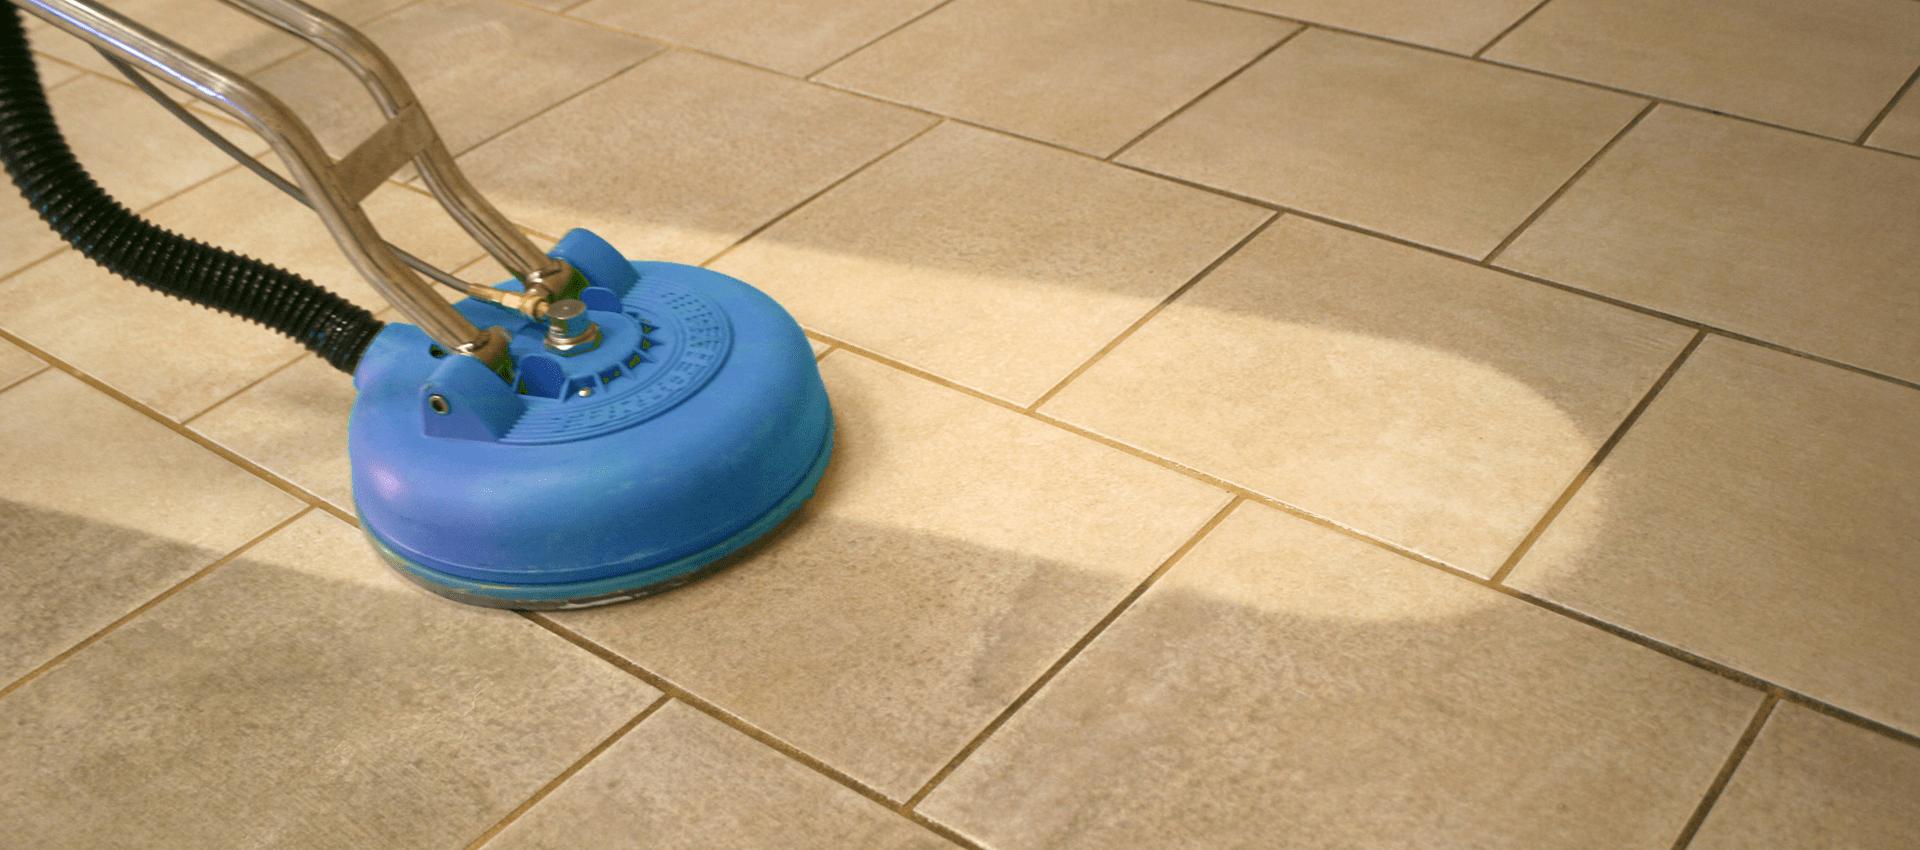 Remarkable Clean Floor Tile Grout Flooring Cleaning Tile Floors Download Free Architecture Designs Embacsunscenecom